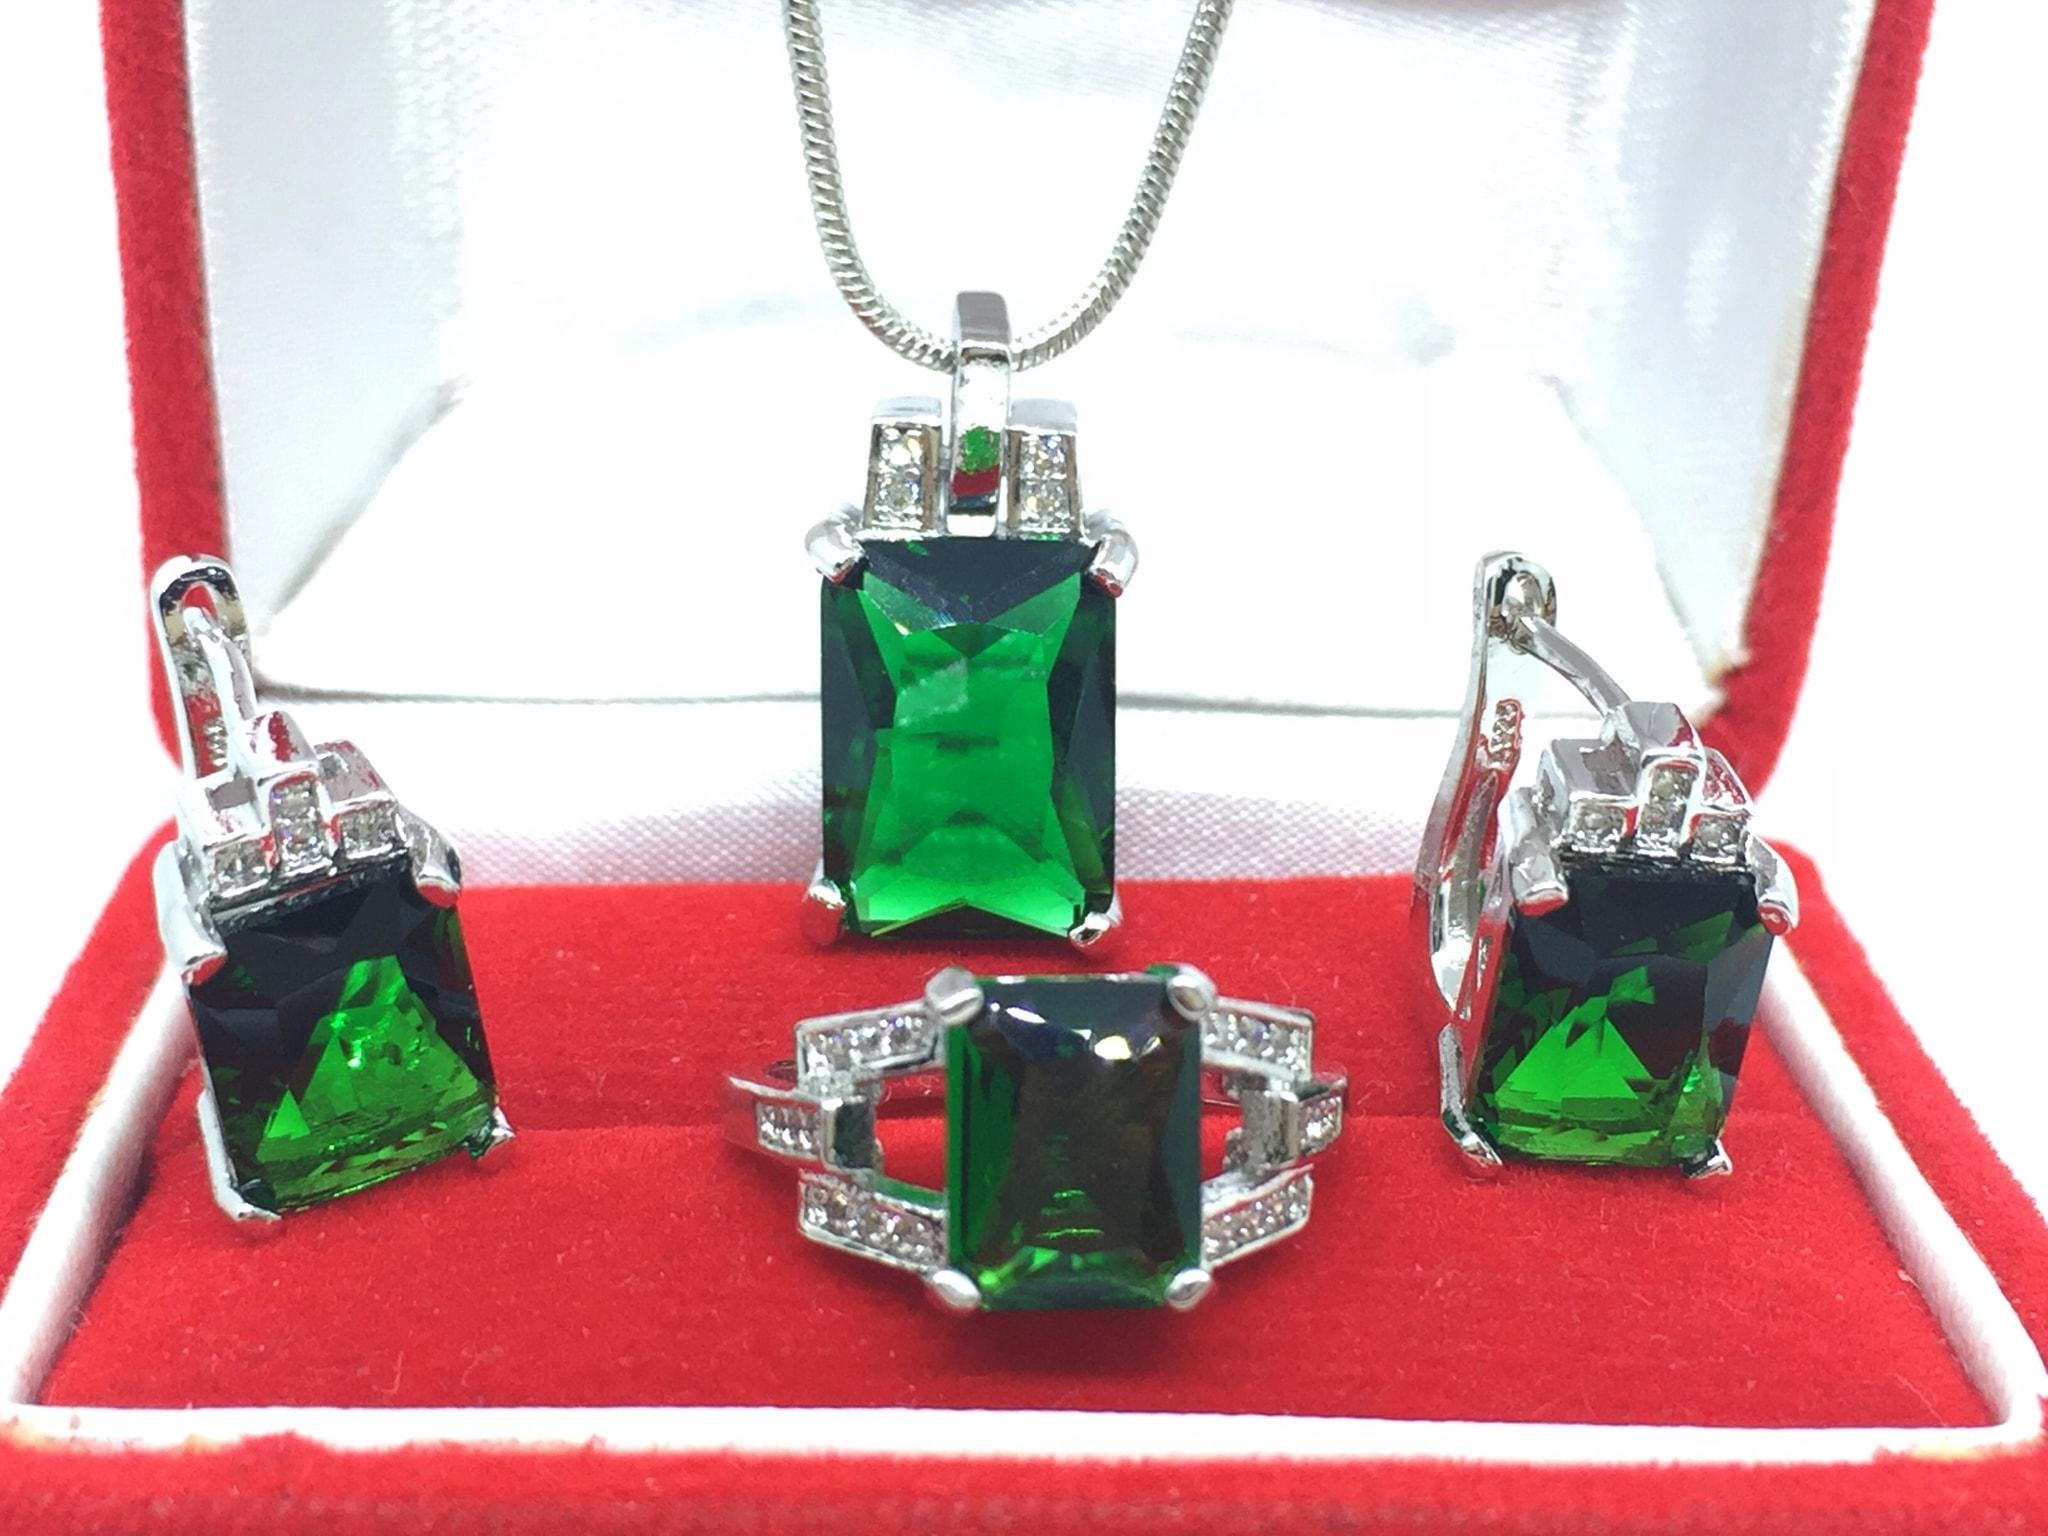 NEW PROMO Perhiasan Aksesoris Set Perhiasan Cincin Kalung Anting Batu Hijau Lapis Emas Putih BN085 Murah